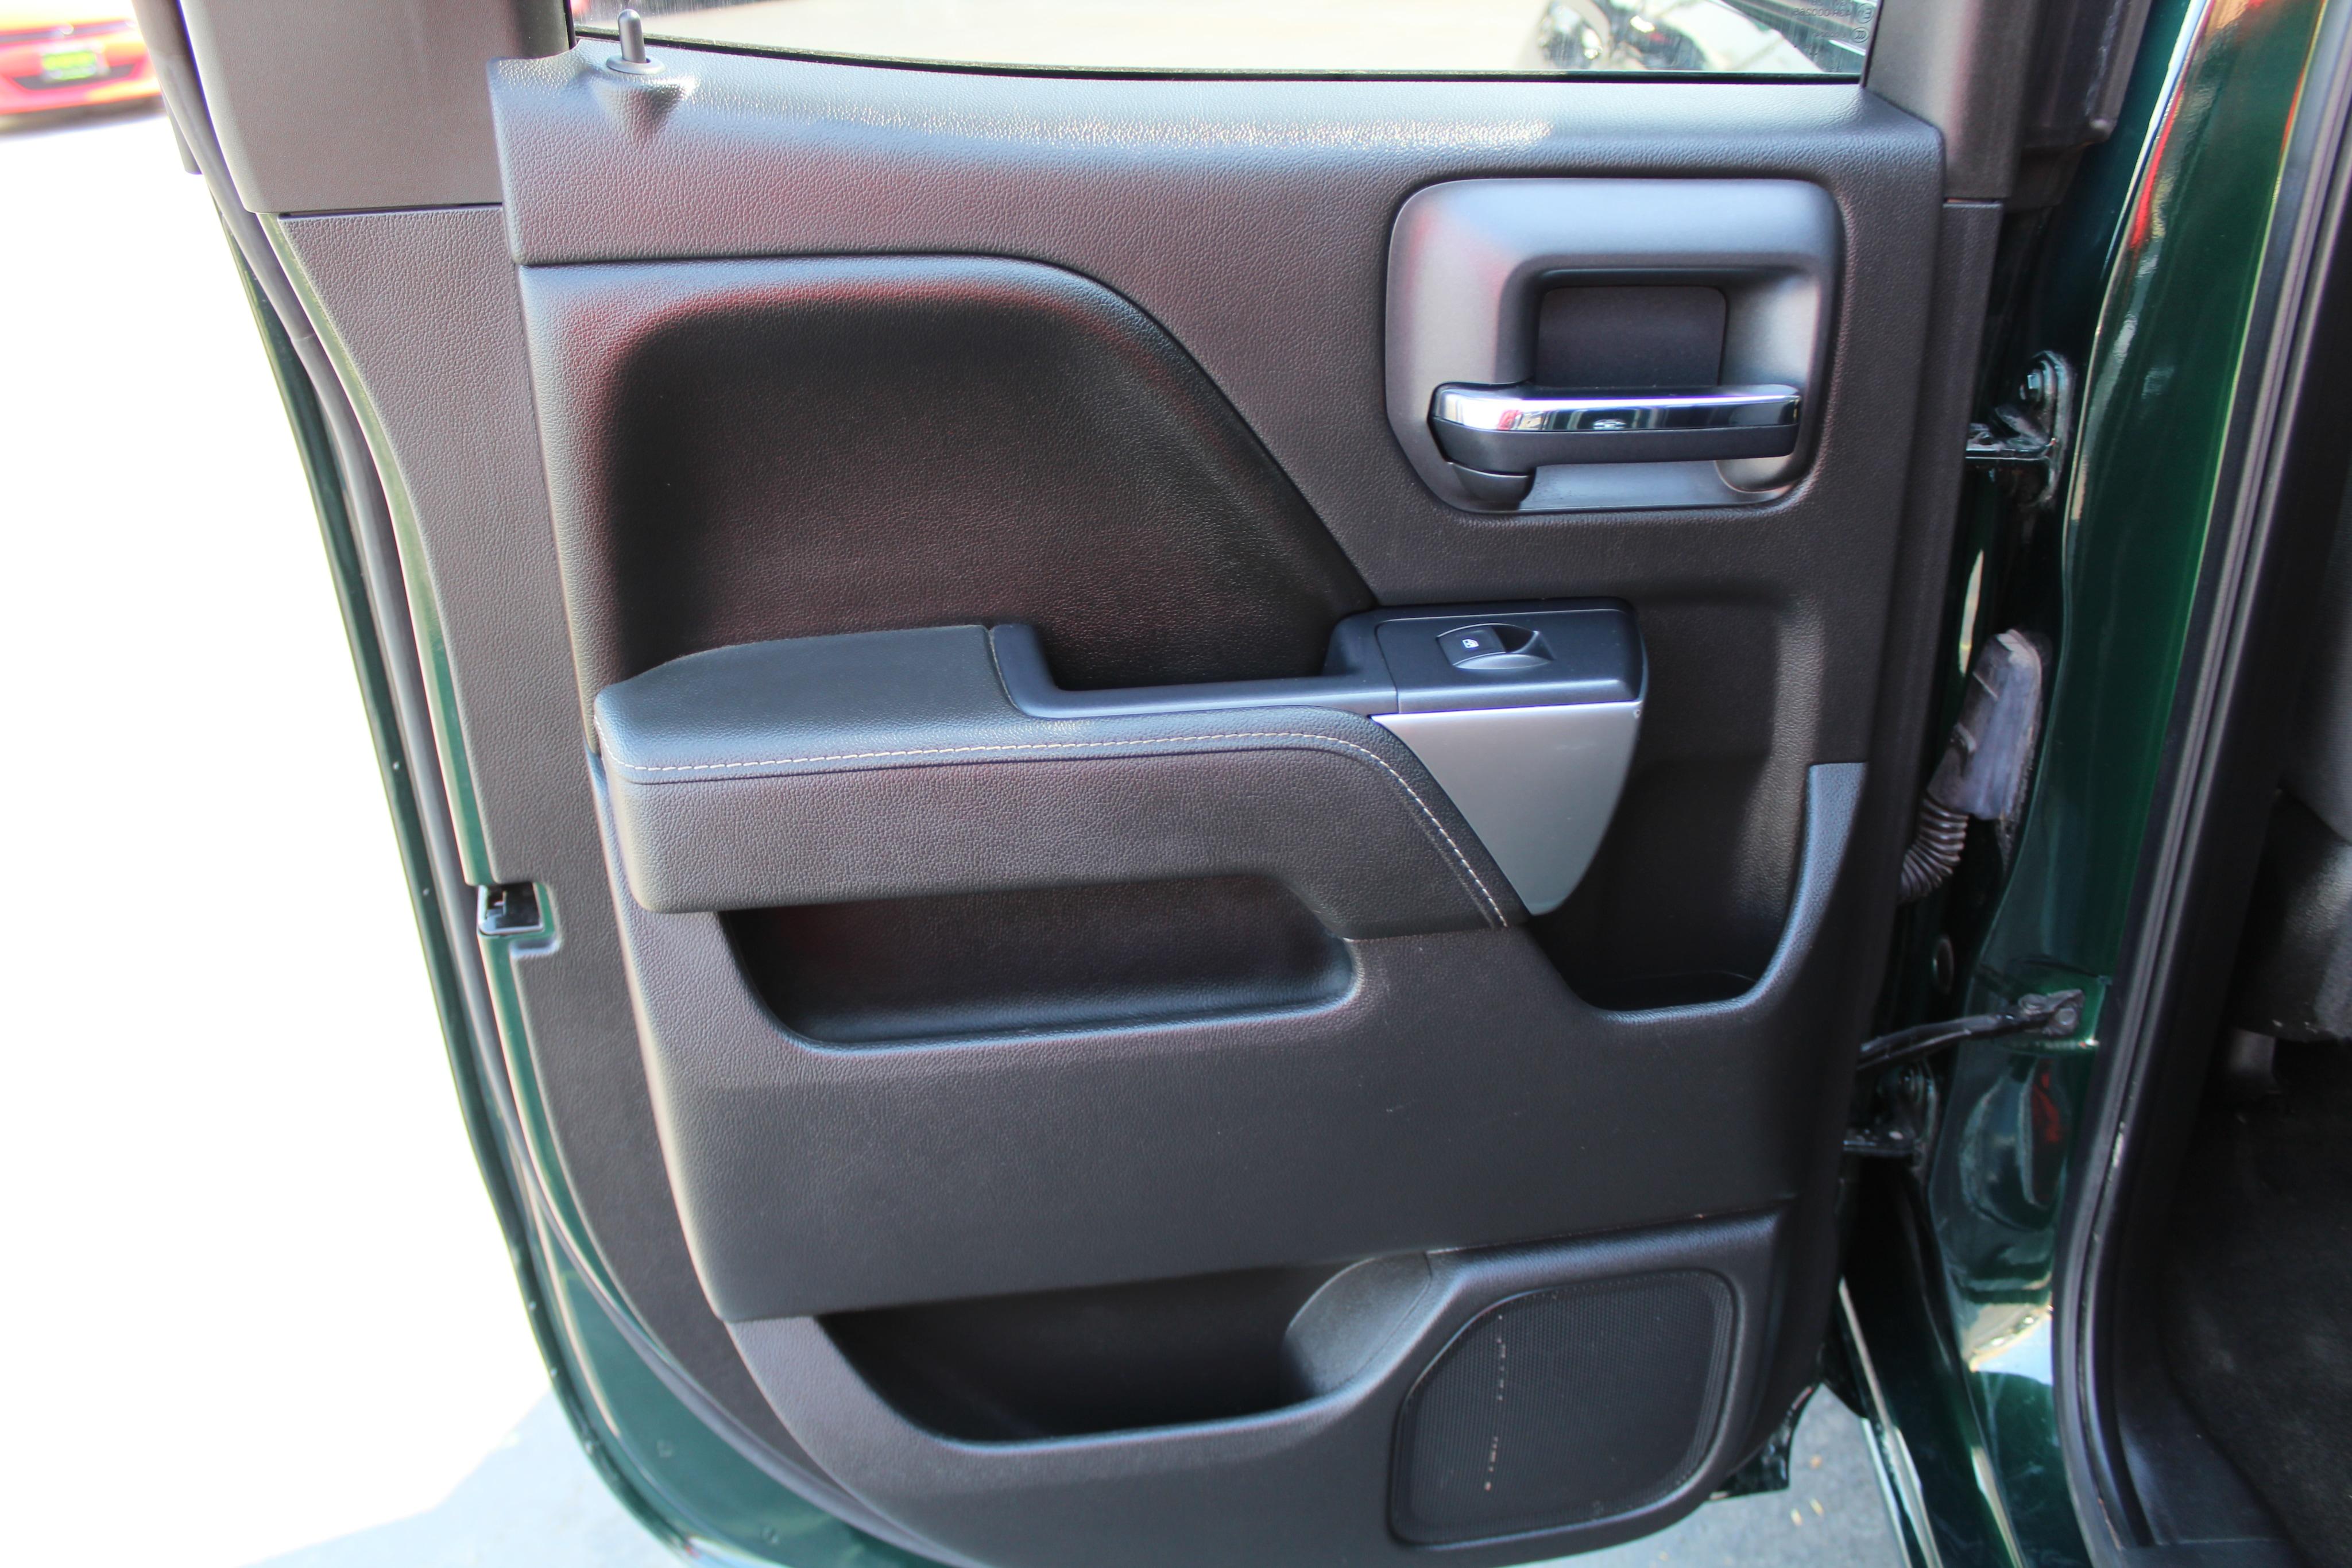 2015 Chevrolet Silverado 1500 Extended Cab Pickup